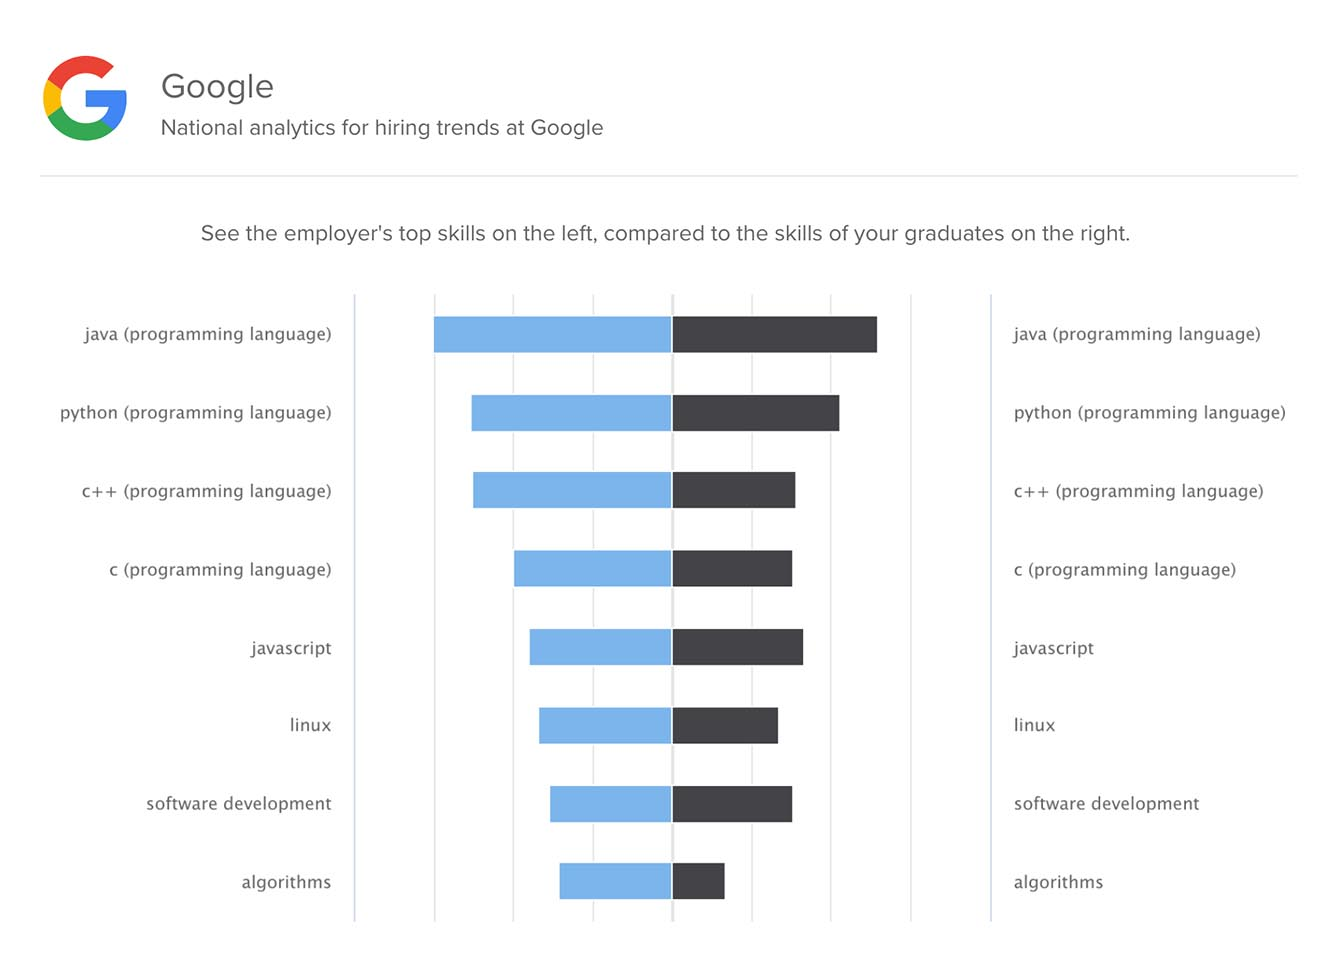 Steppingblocks Institutional Research Top Job Skills